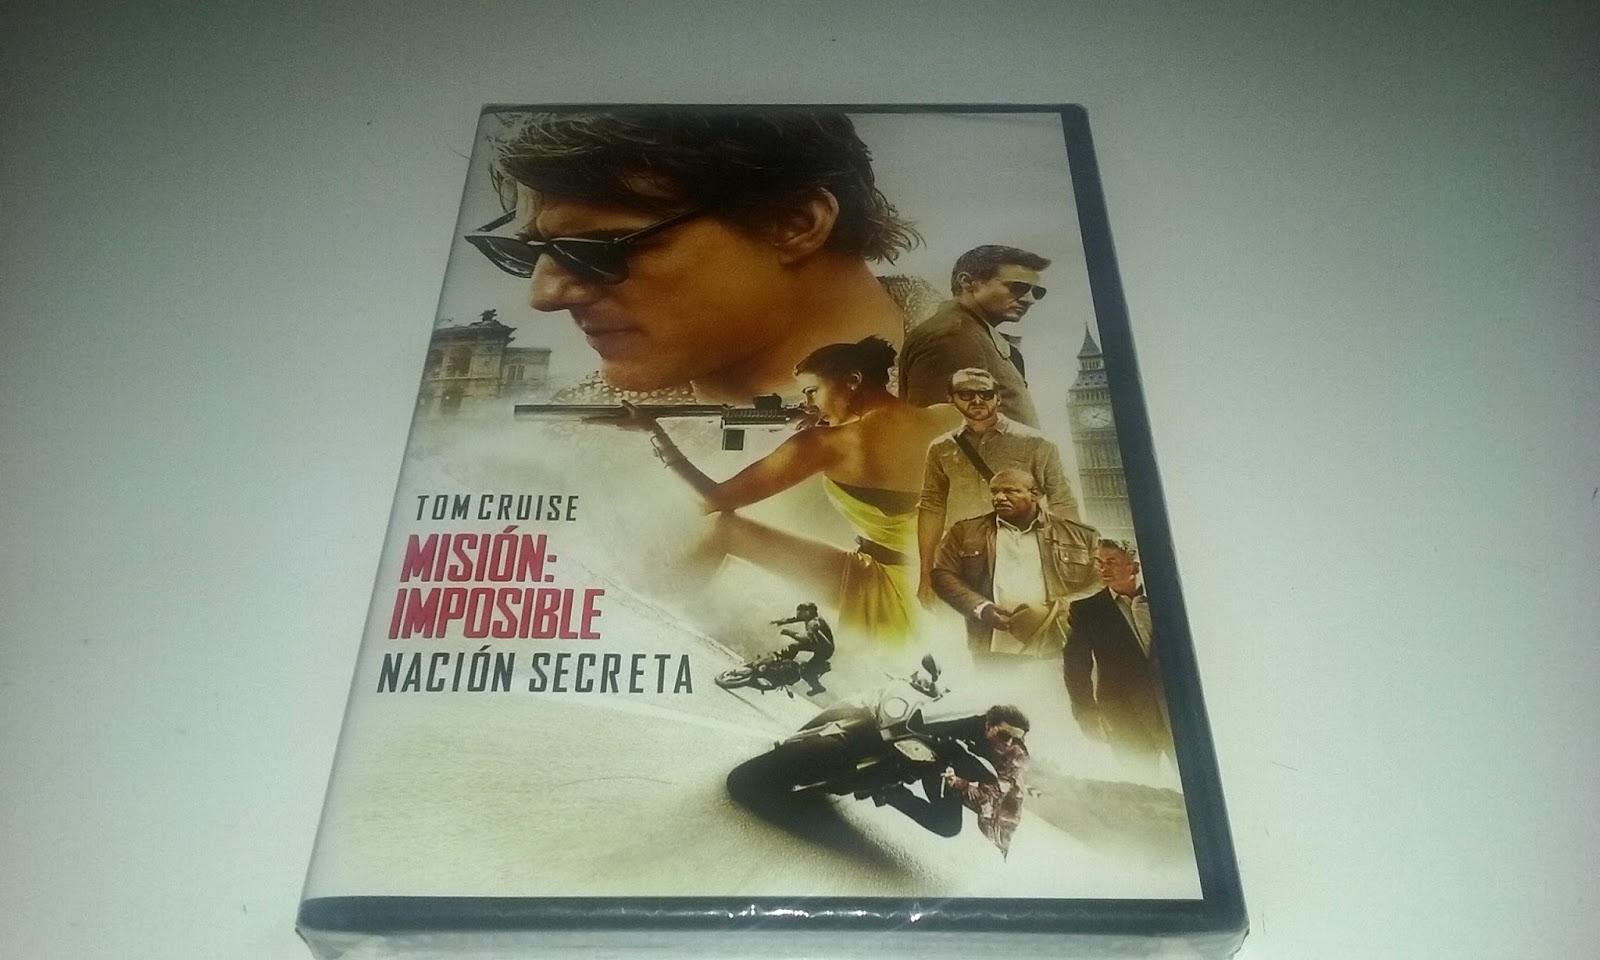 Consigue un DVD de 'Misión imposible: Nación secreta'